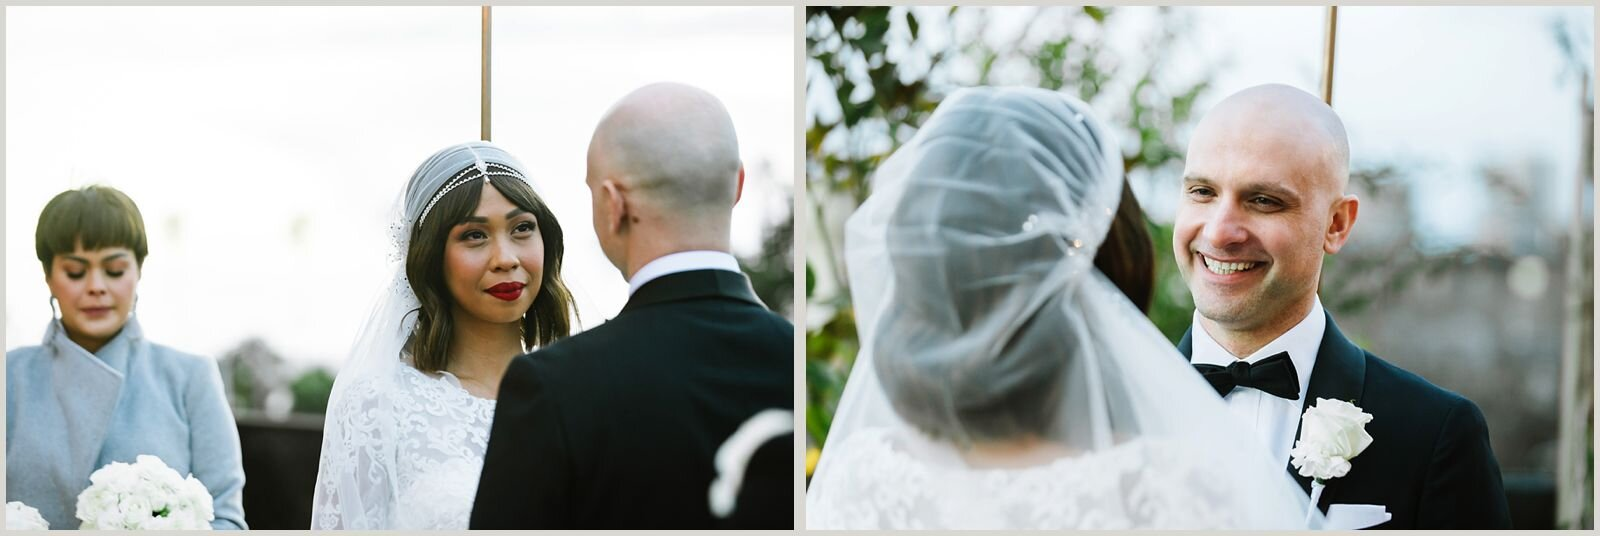 joseph_koprek_wedding_melbourne_the_prince_deck_0059.jpg